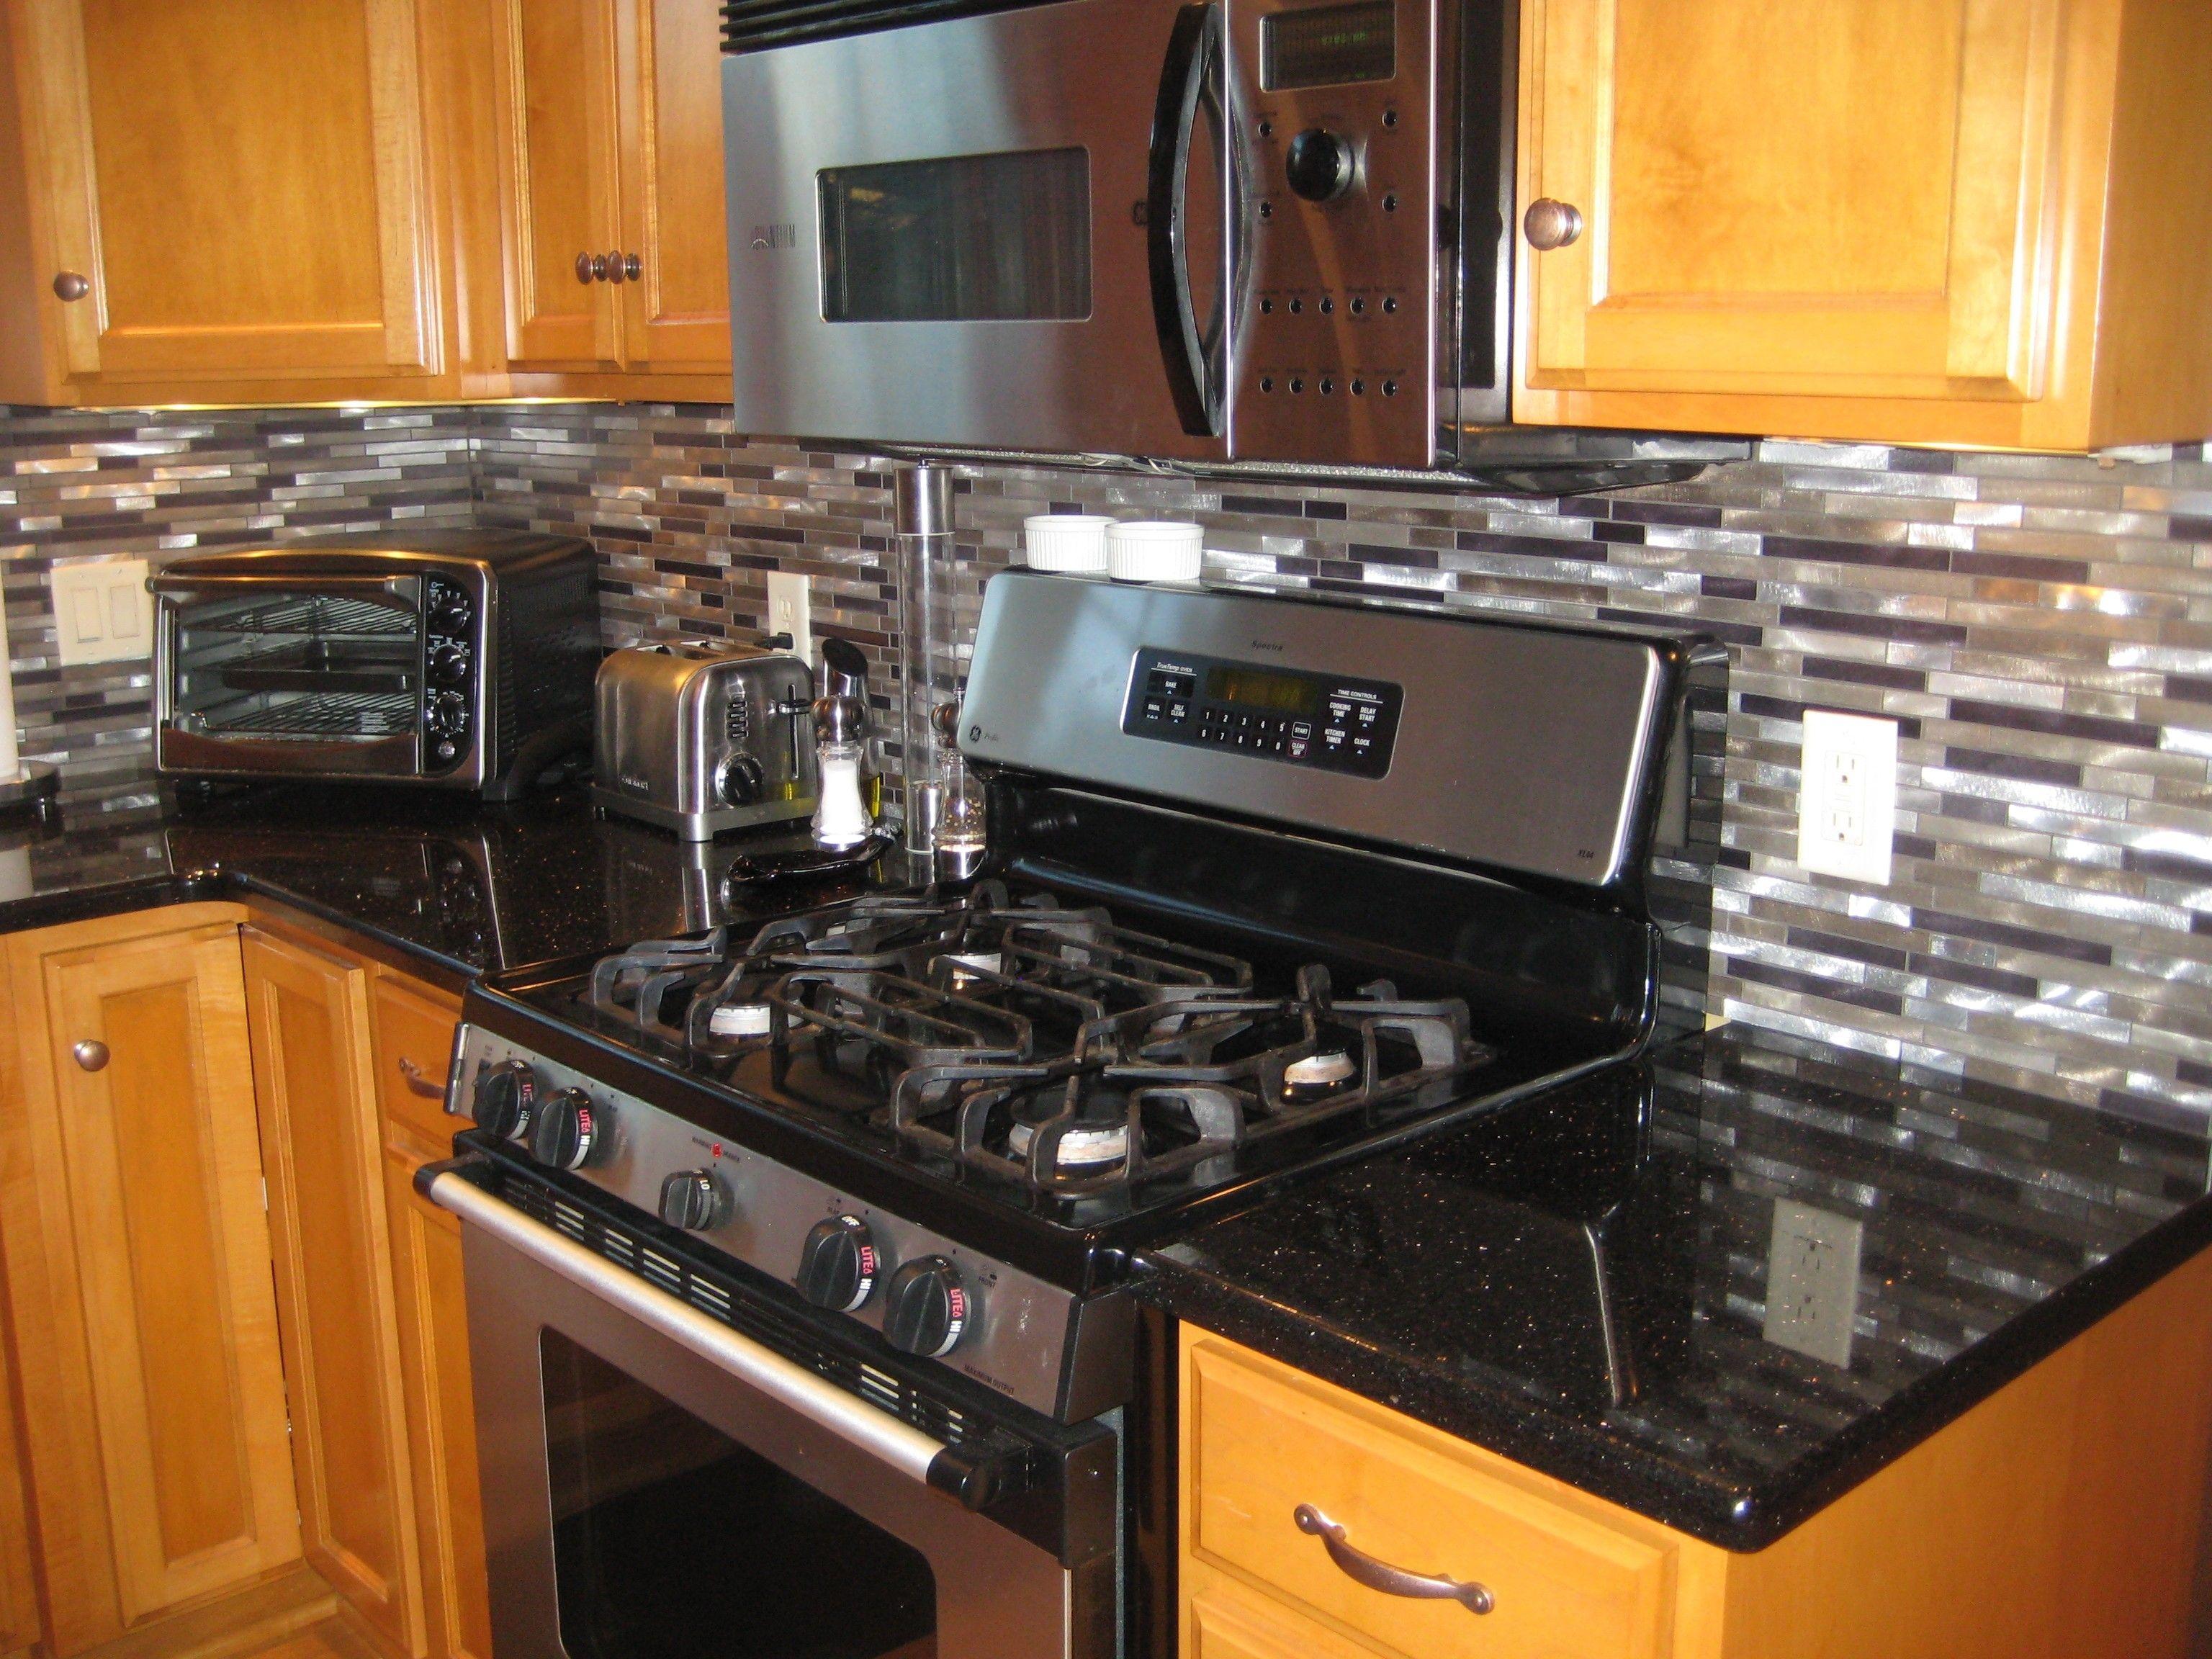 kitchen backsplash for black granite countertops on outdoor kitchen backsplash id=14852